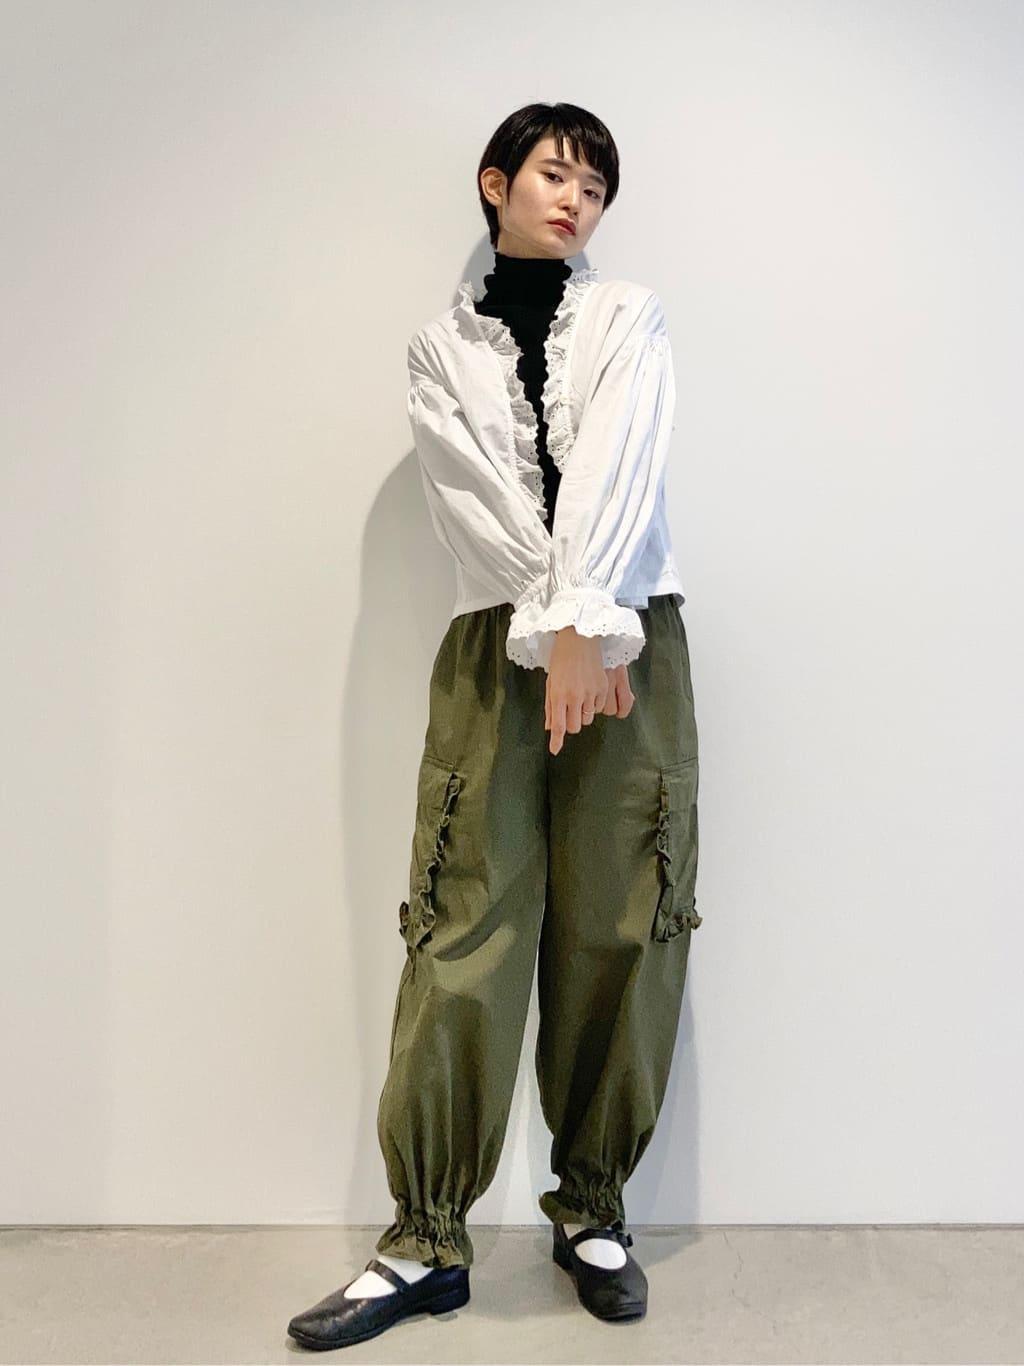 FLAT AMB 南堀江 2021.10.19